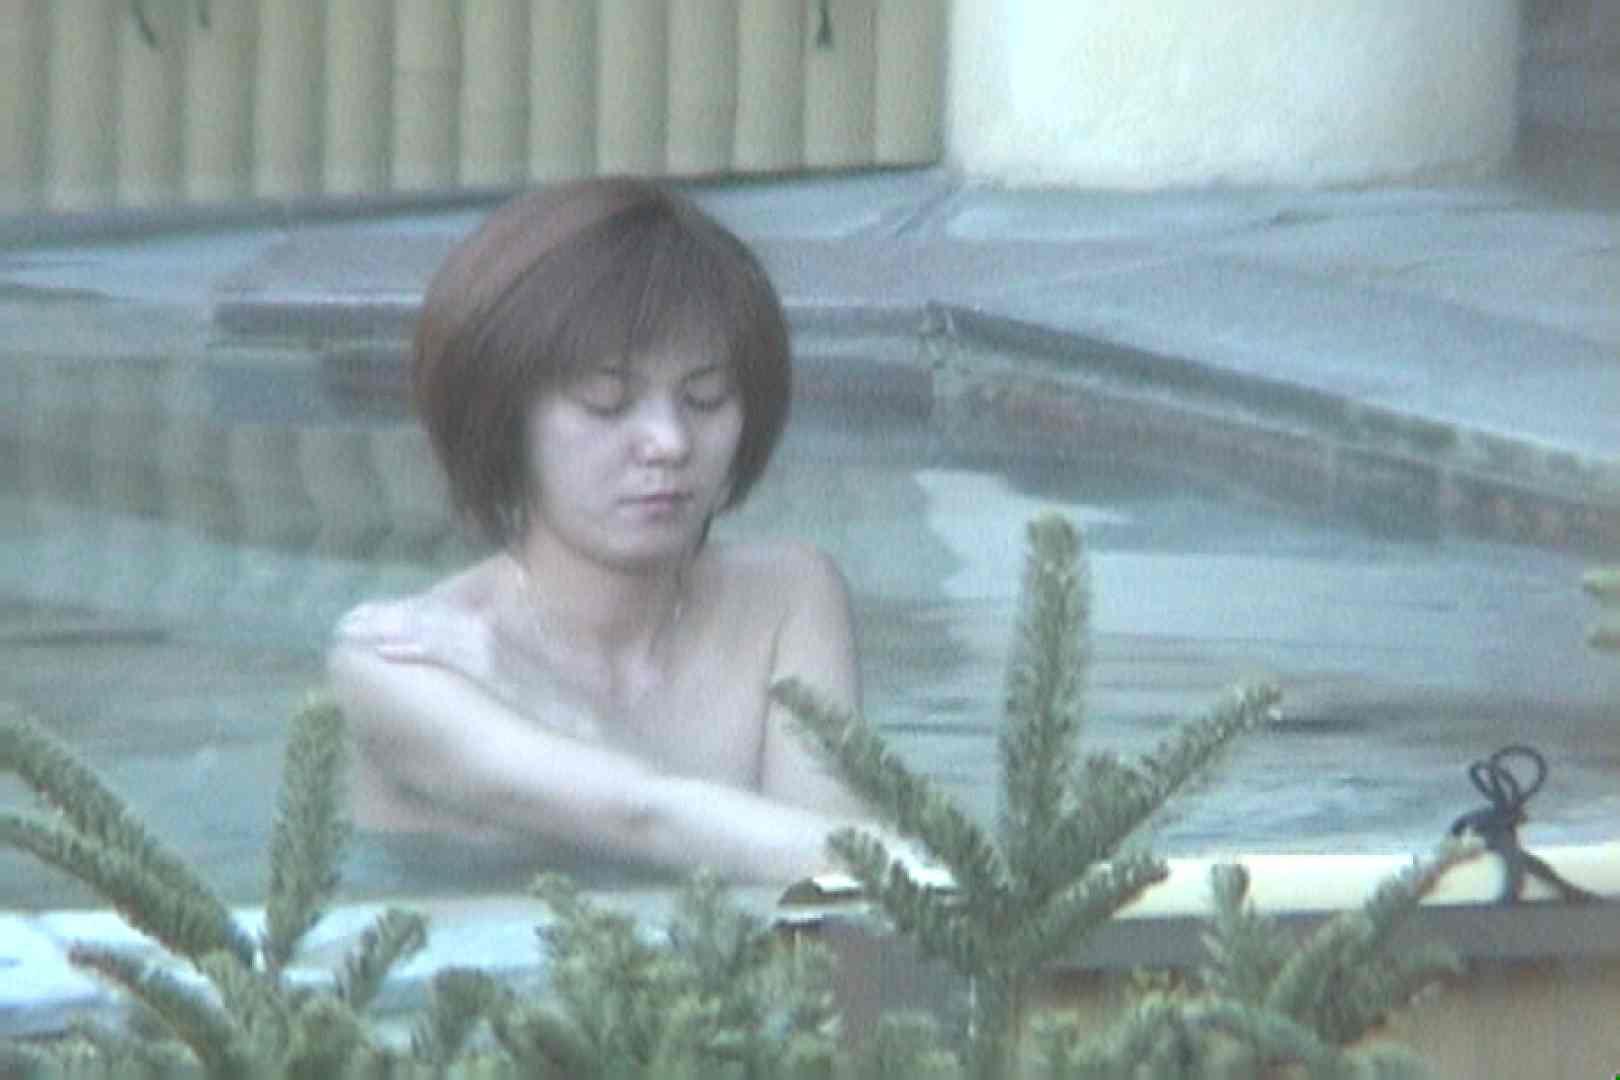 Aquaな露天風呂Vol.560 OLのエロ生活 オマンコ無修正動画無料 46連発 32